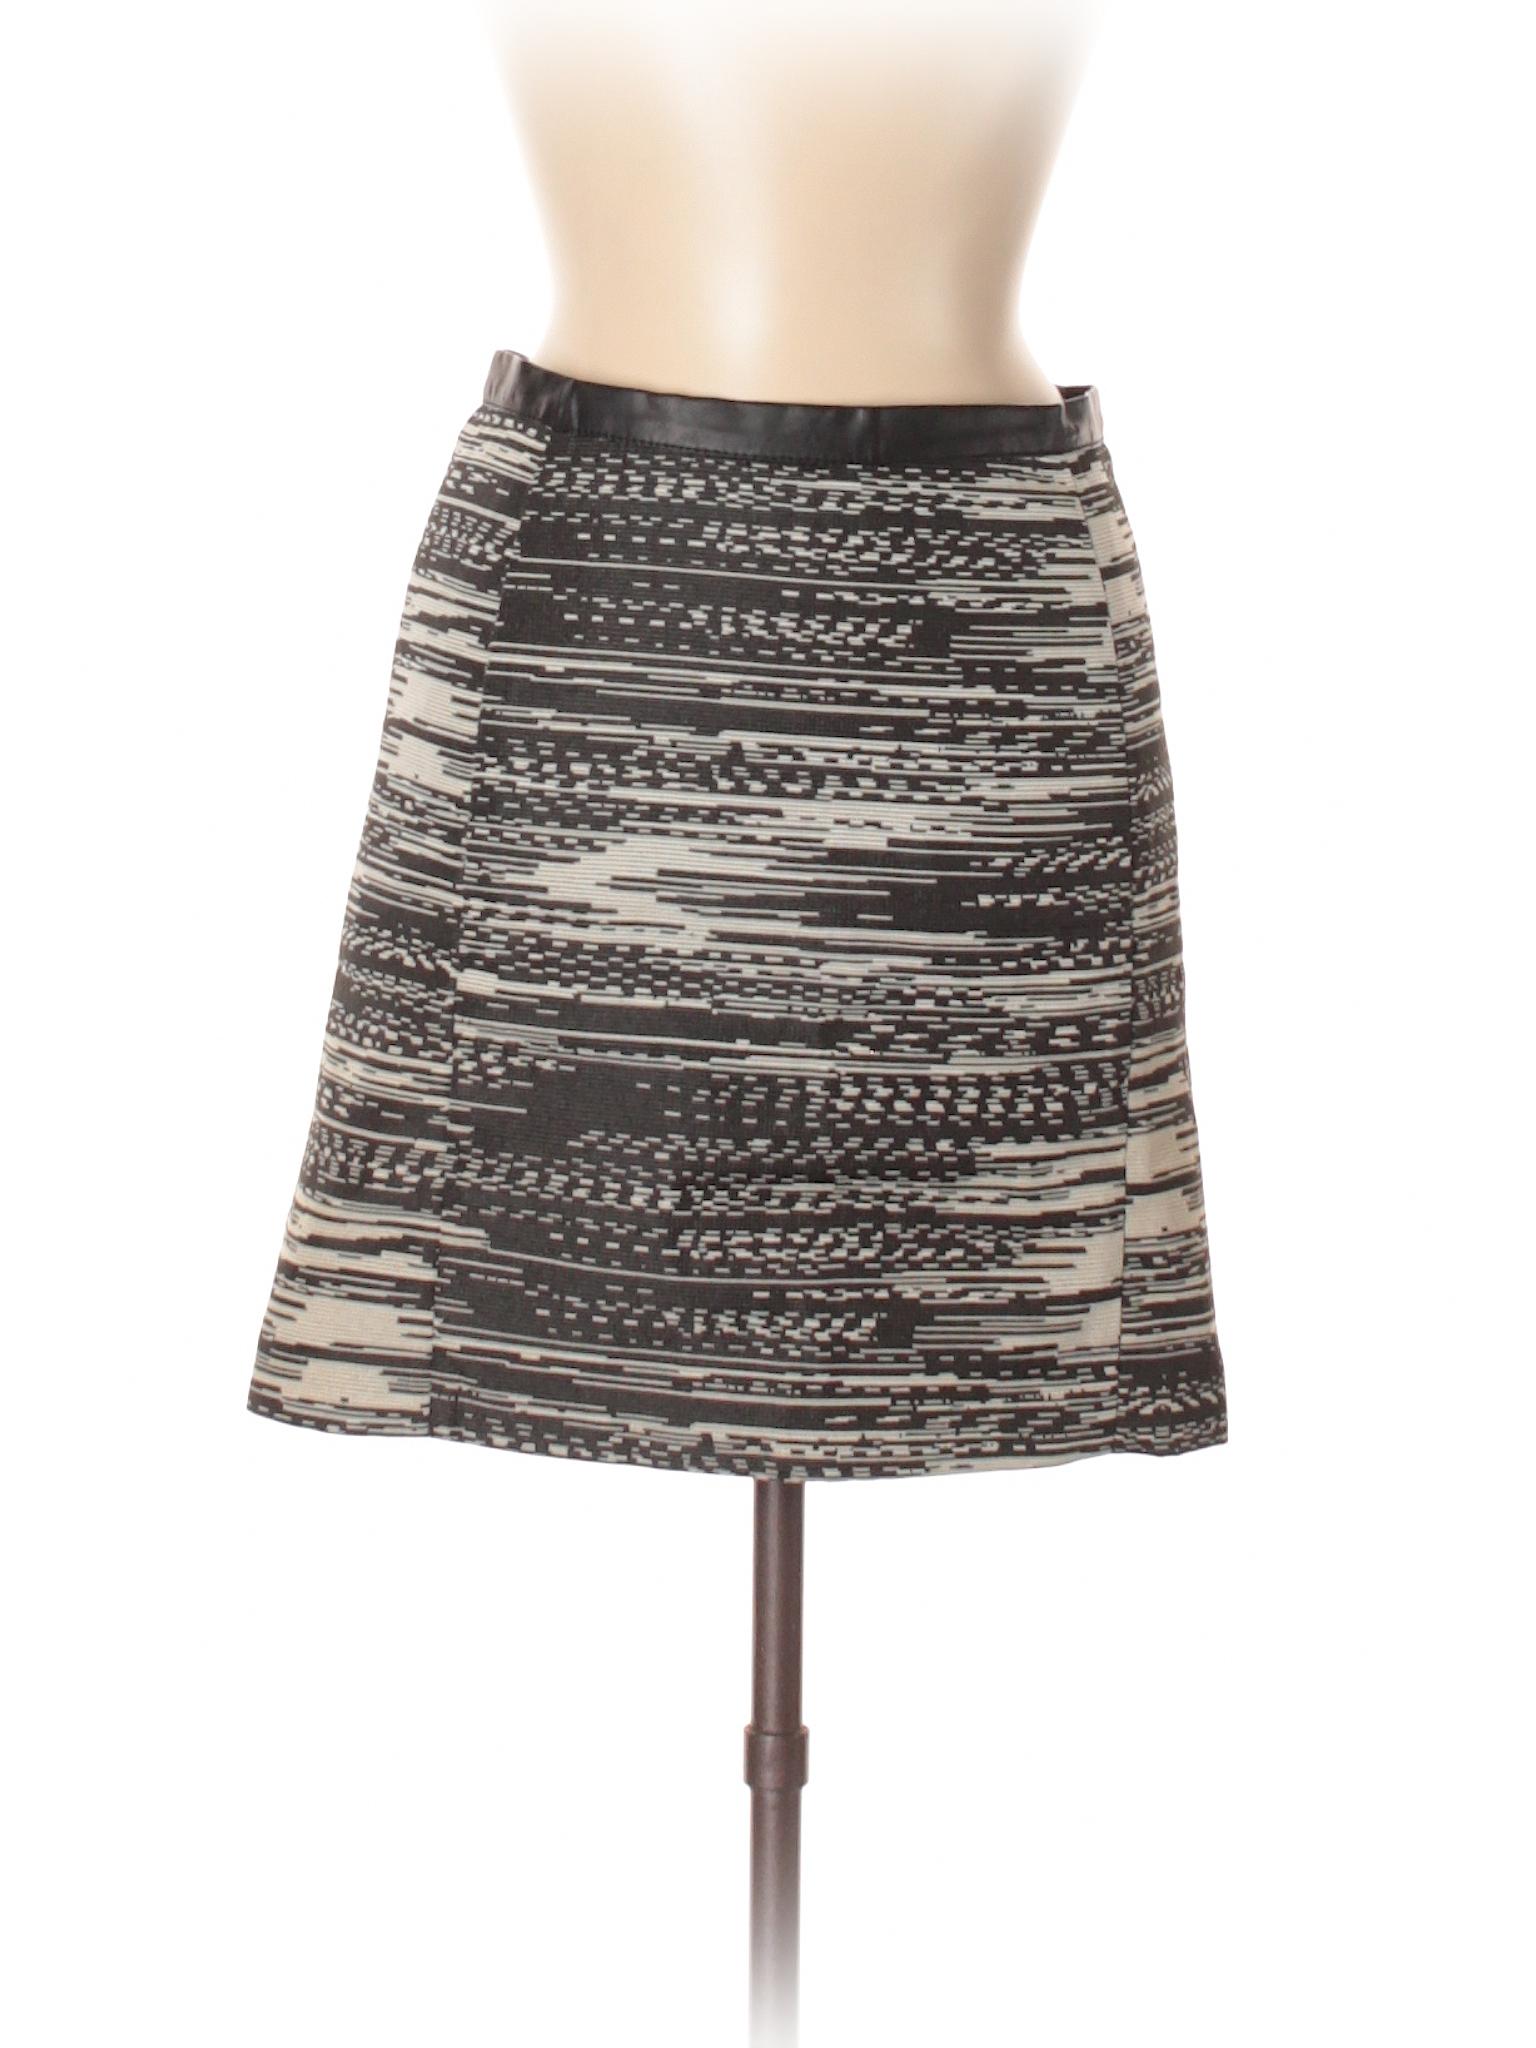 Boutique Casual amp;M Skirt H leisure 7TrtFTqw